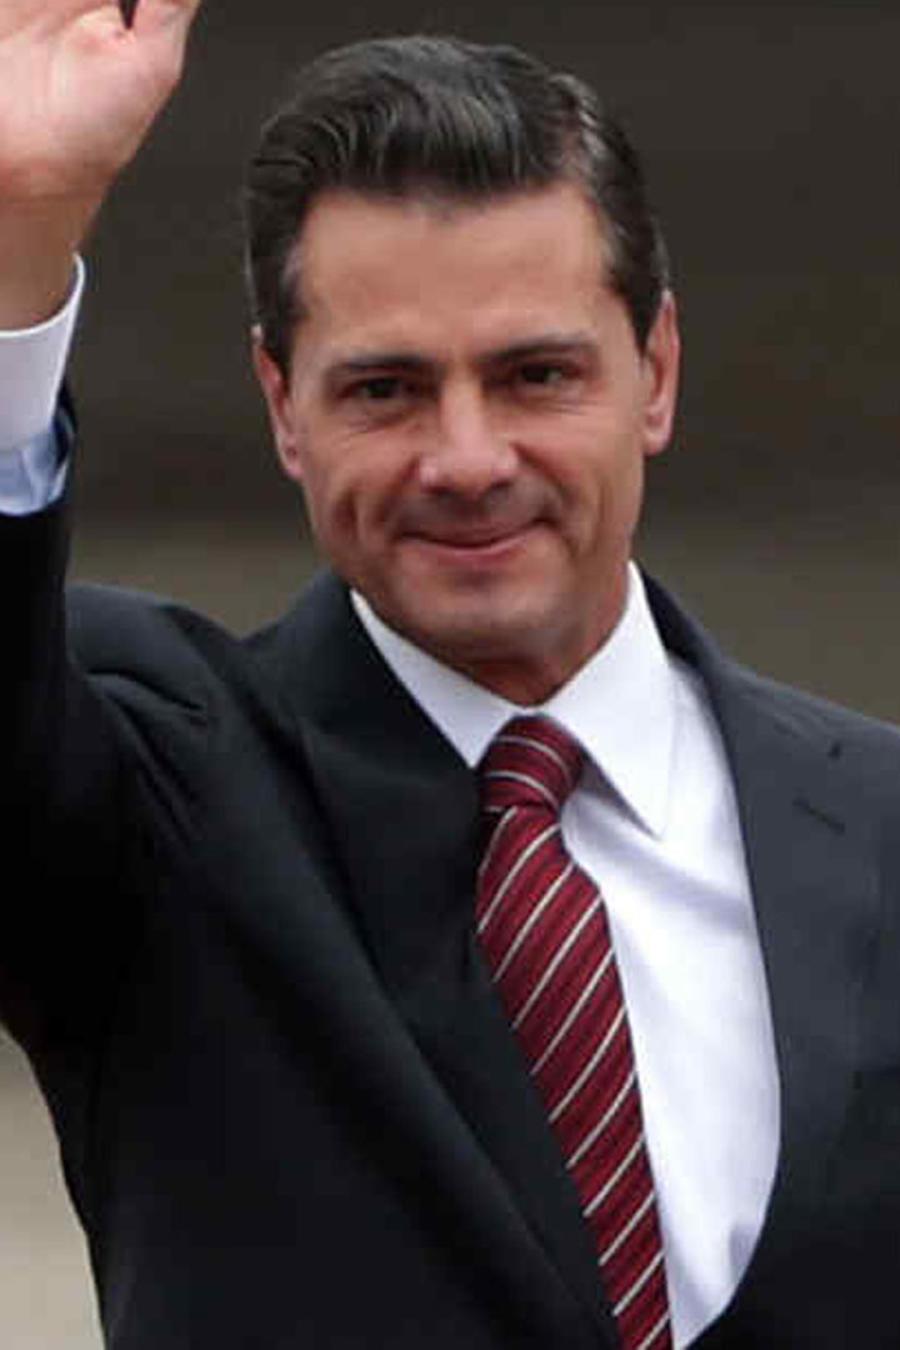 Enrique Peña Nieto y Tania Ruiz Eichelmann